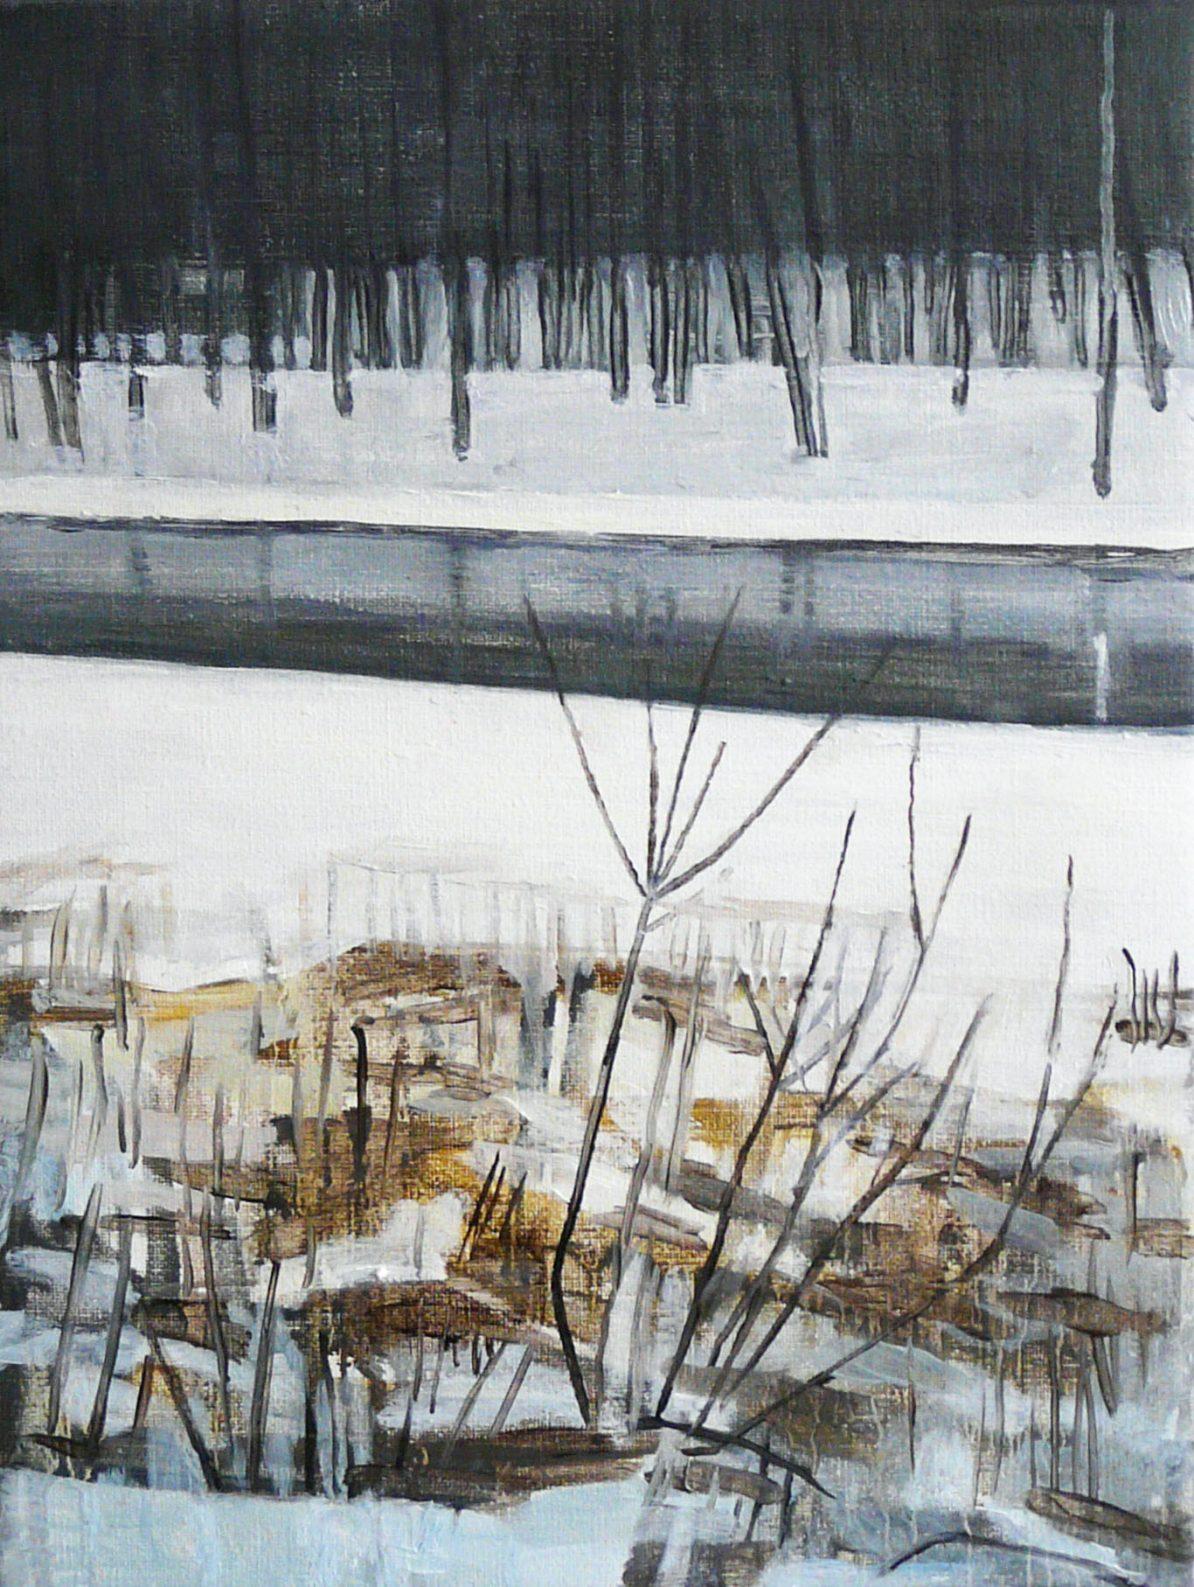 Riverside winter 2 (b), 2016. Oil, canvas. 40 x 30 cm